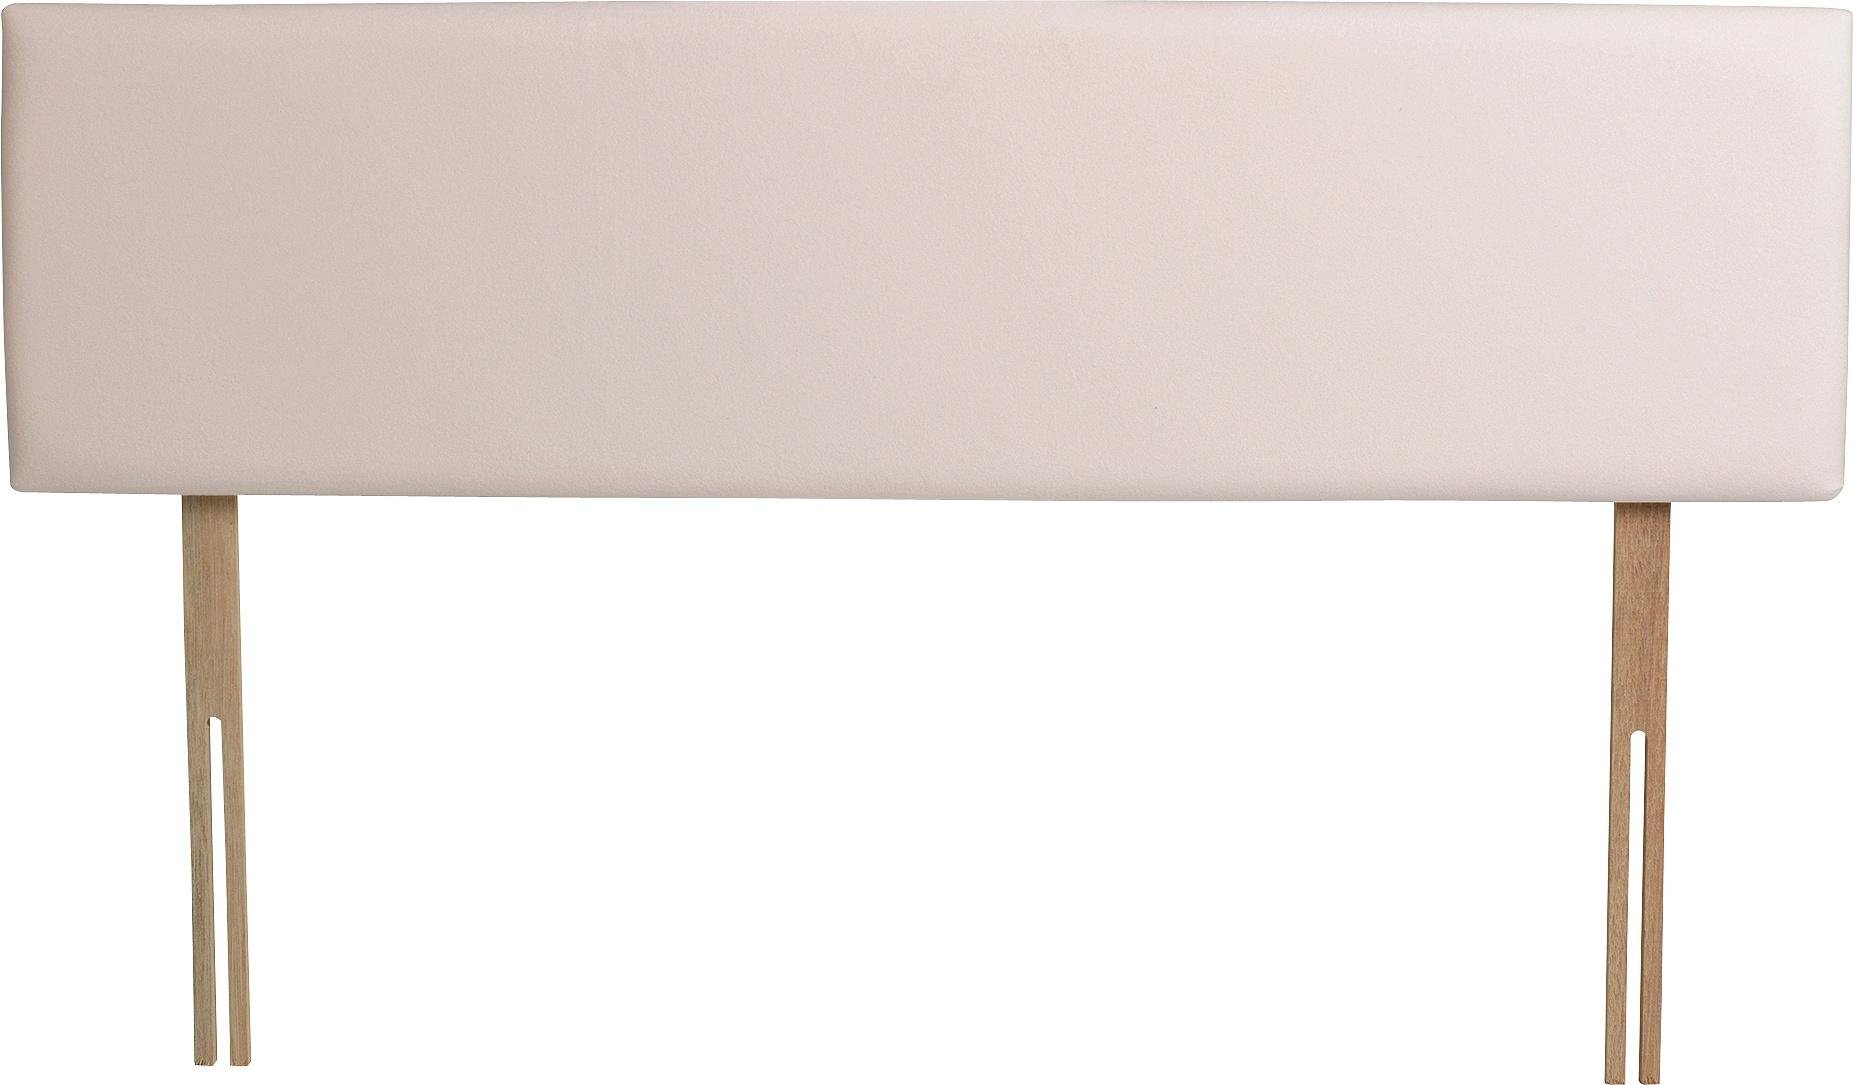 Airsprung Hollis Kingsize Headboard - Cream